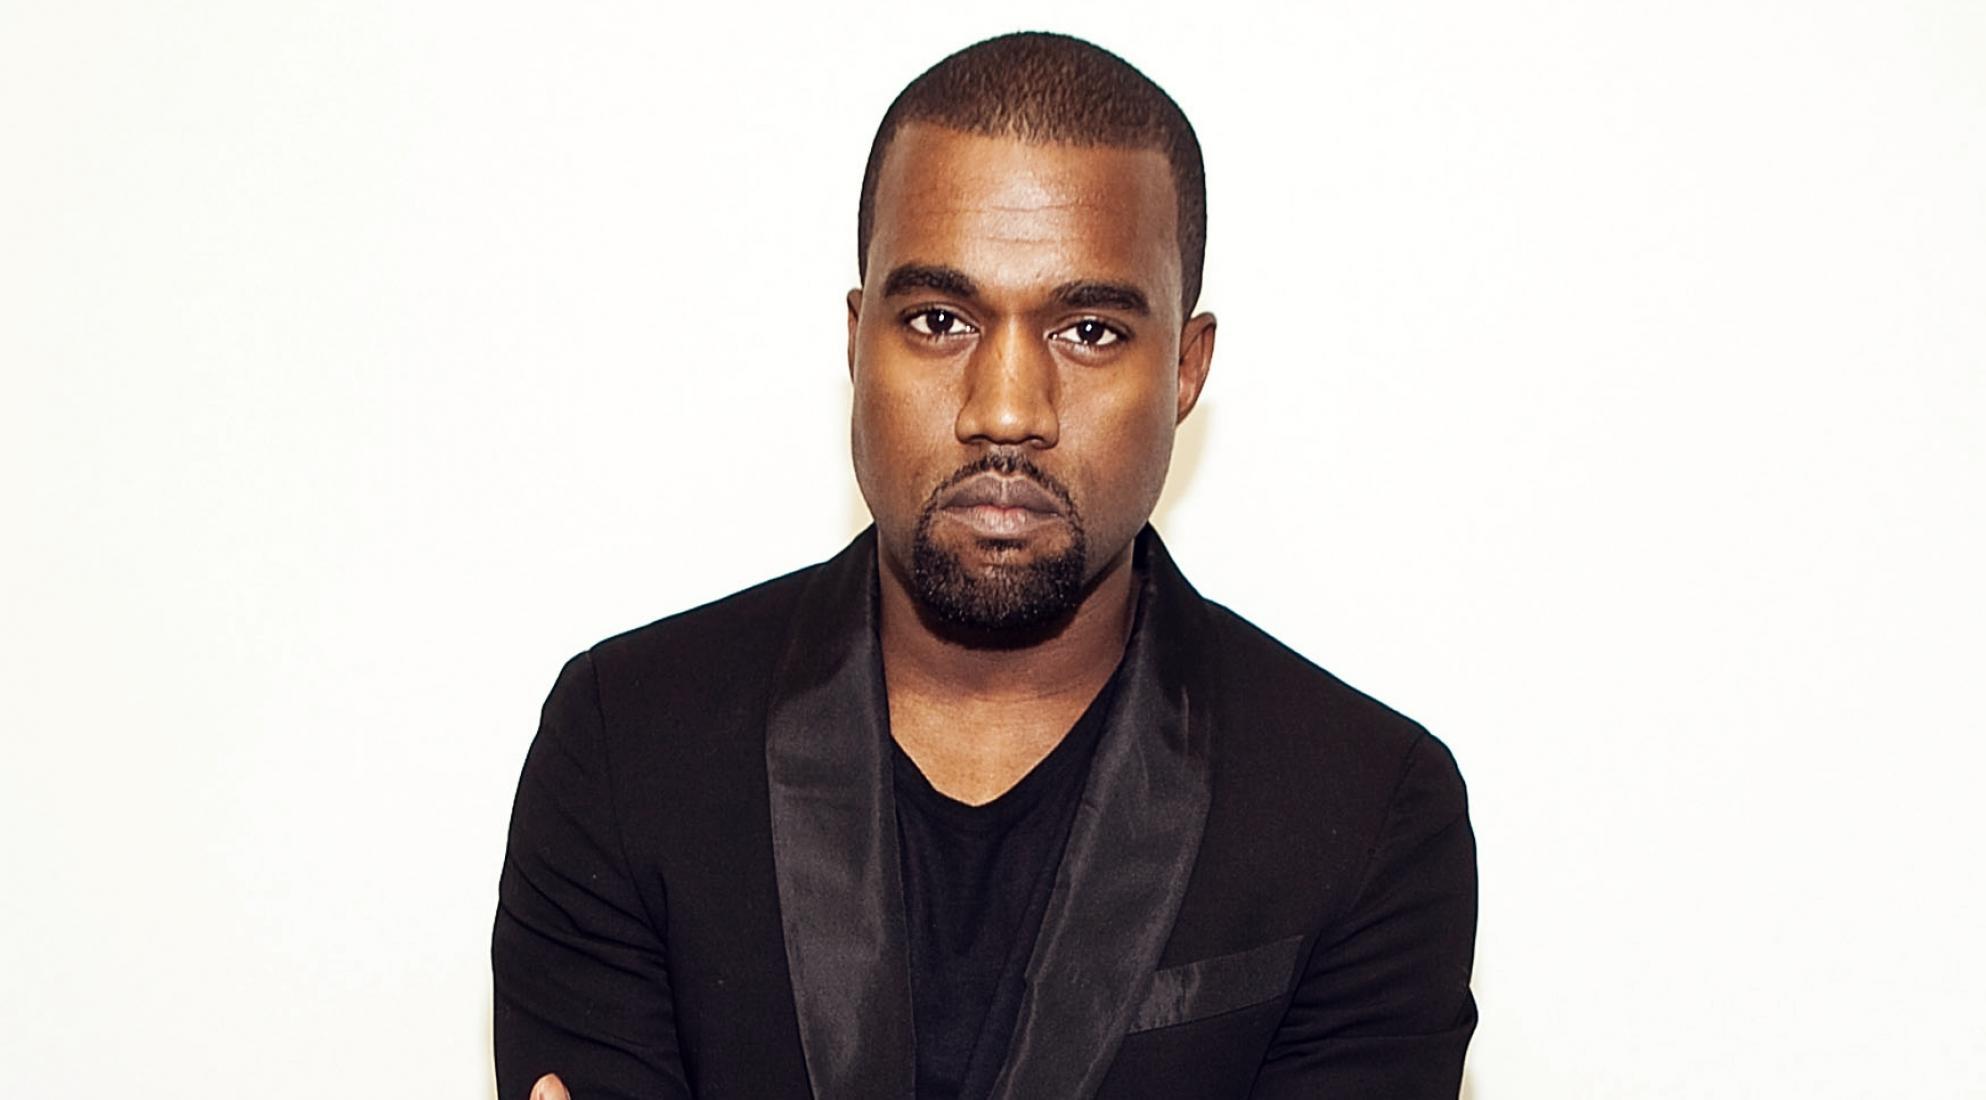 Video of Kanye West urinating on Grammy Award, Video of Kanye West urinating on Grammy Award, Premium News24